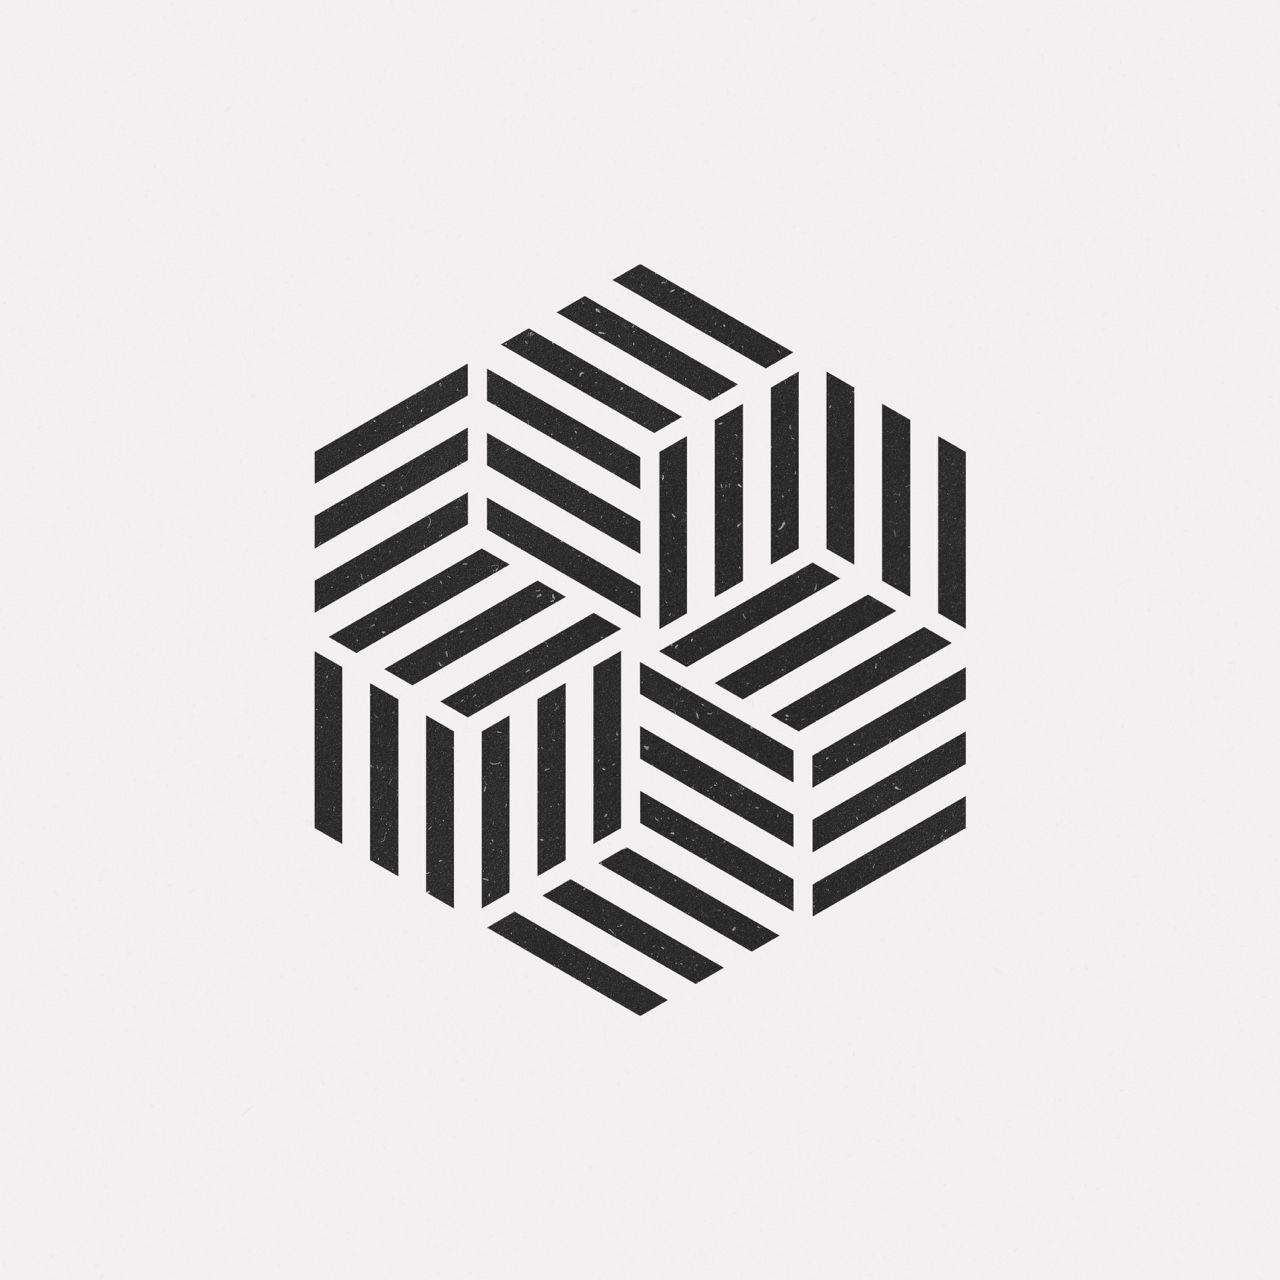 Line art design geometry